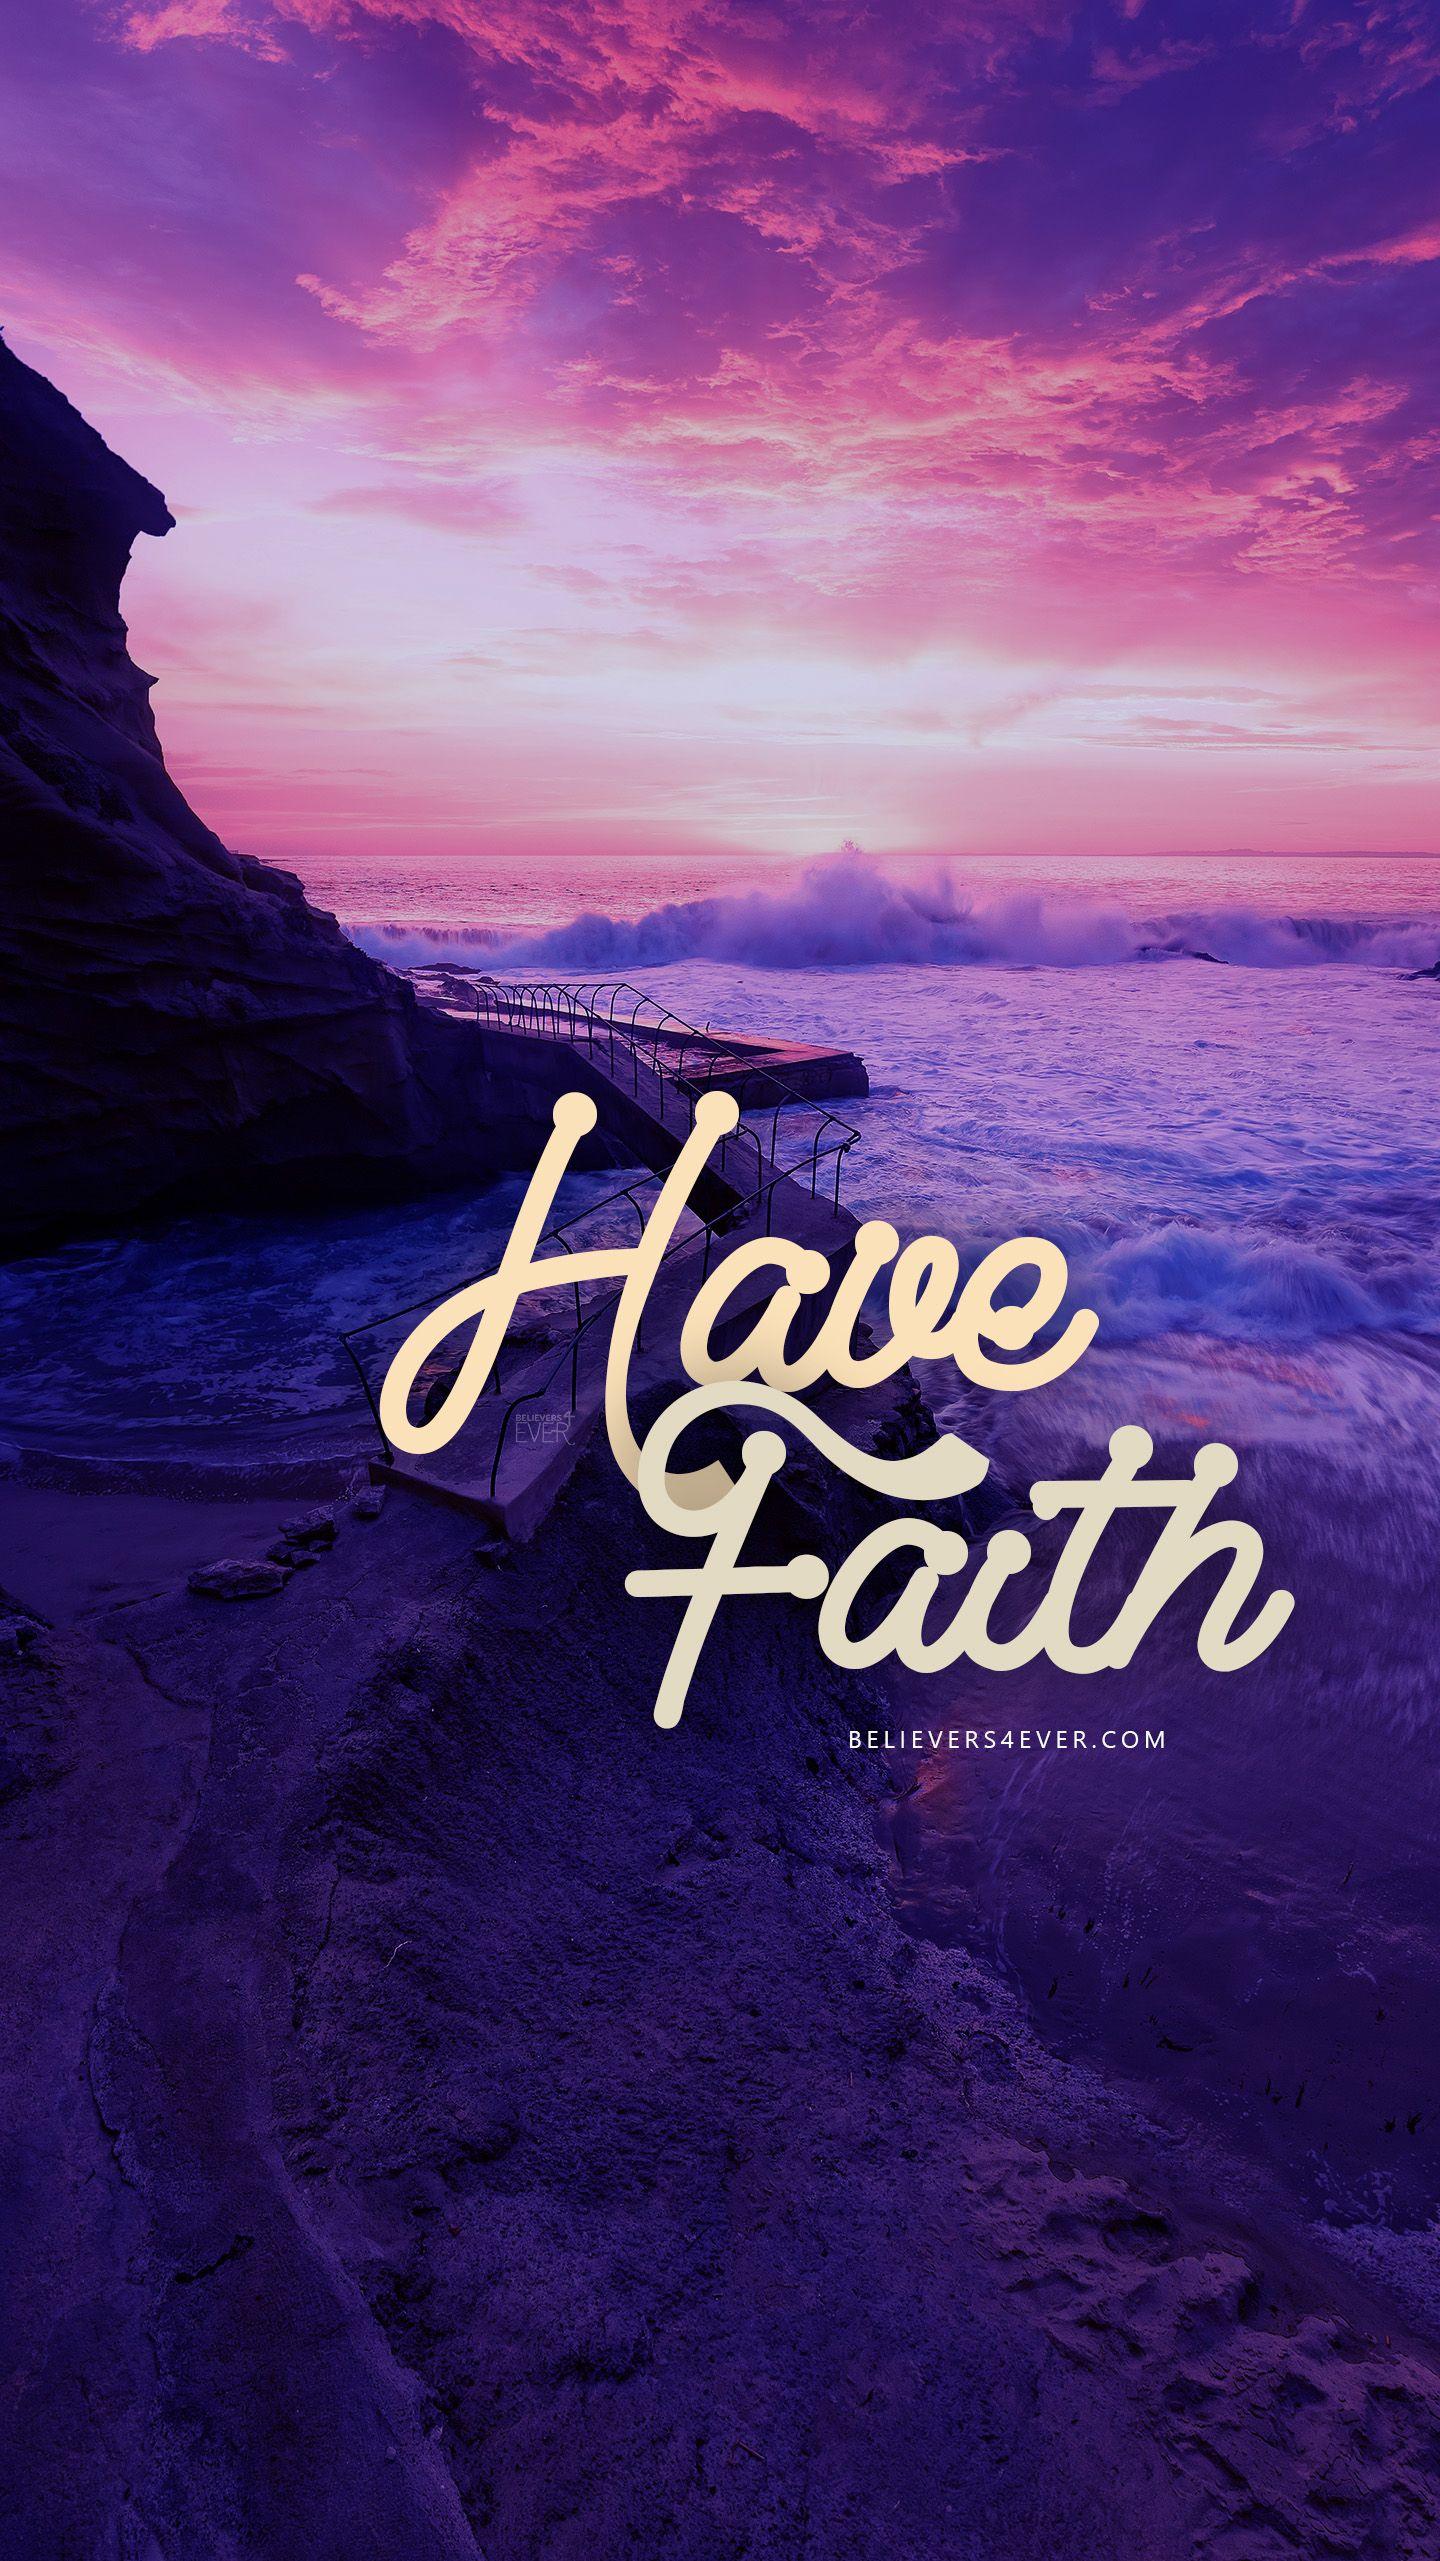 Have Faith   Believers4evercom Spiritual wallpaper Ipad 1440x2561